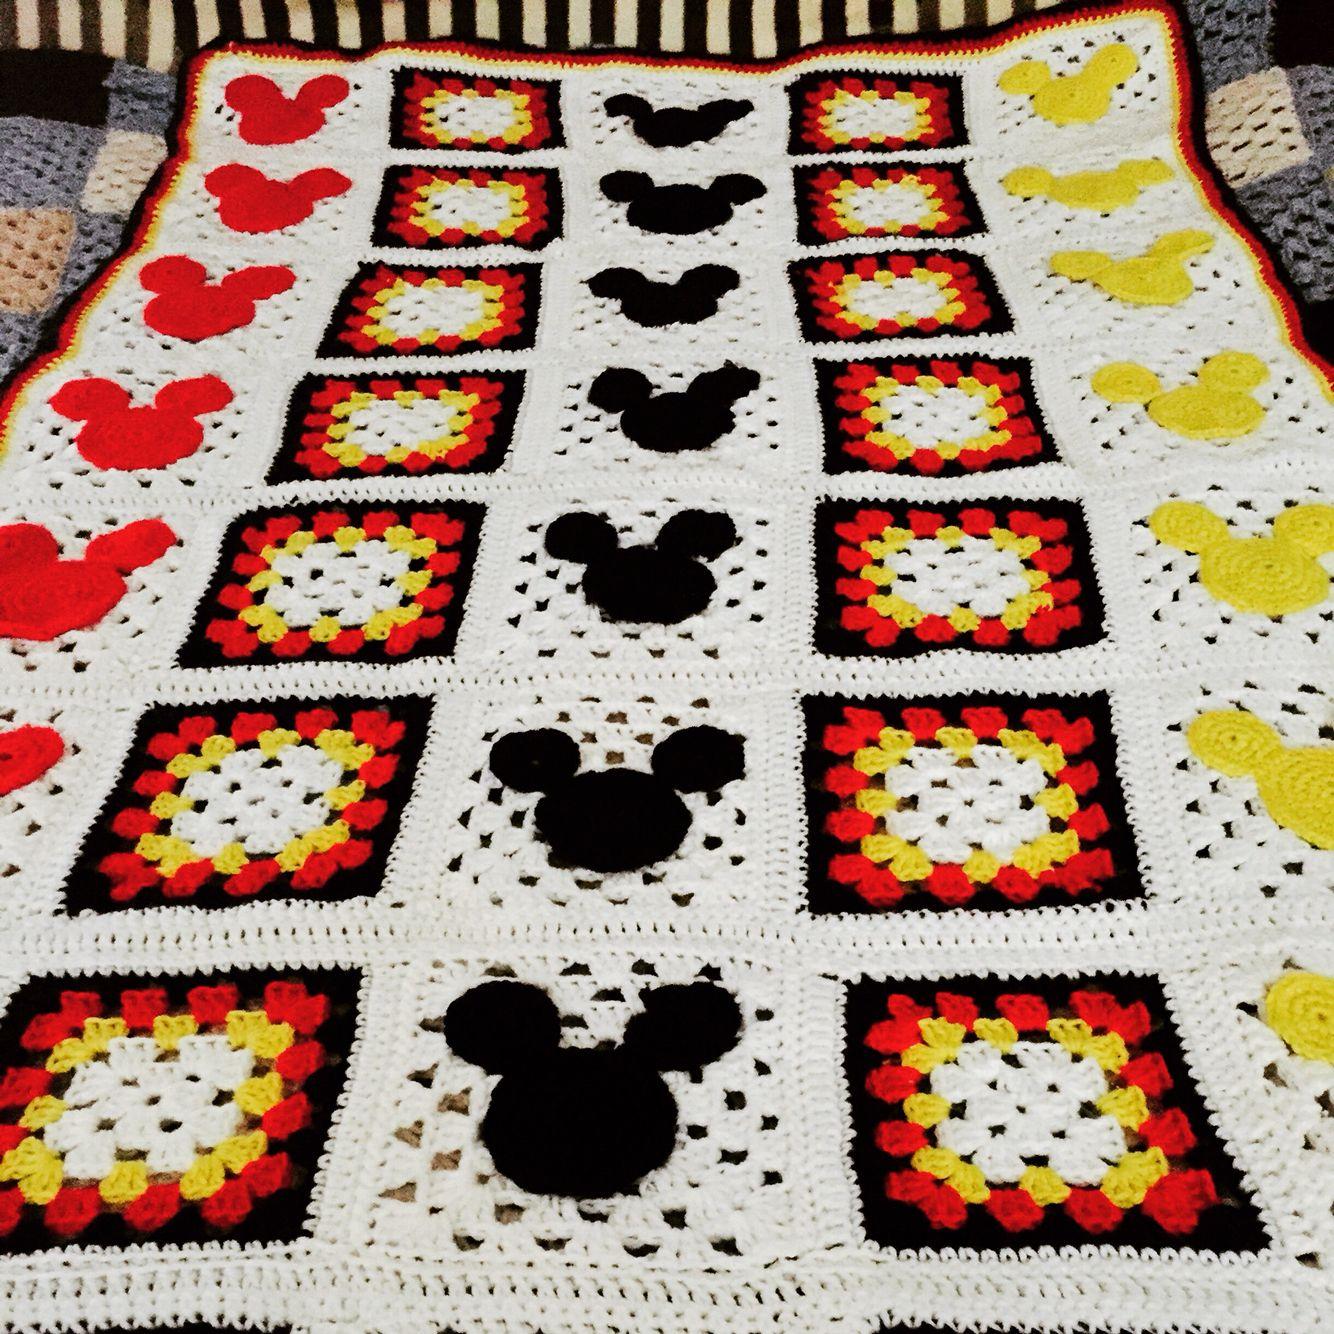 Crochet Mickey Mouse throw blanket | CROCHET Mantas ◘◘ Blankets ...